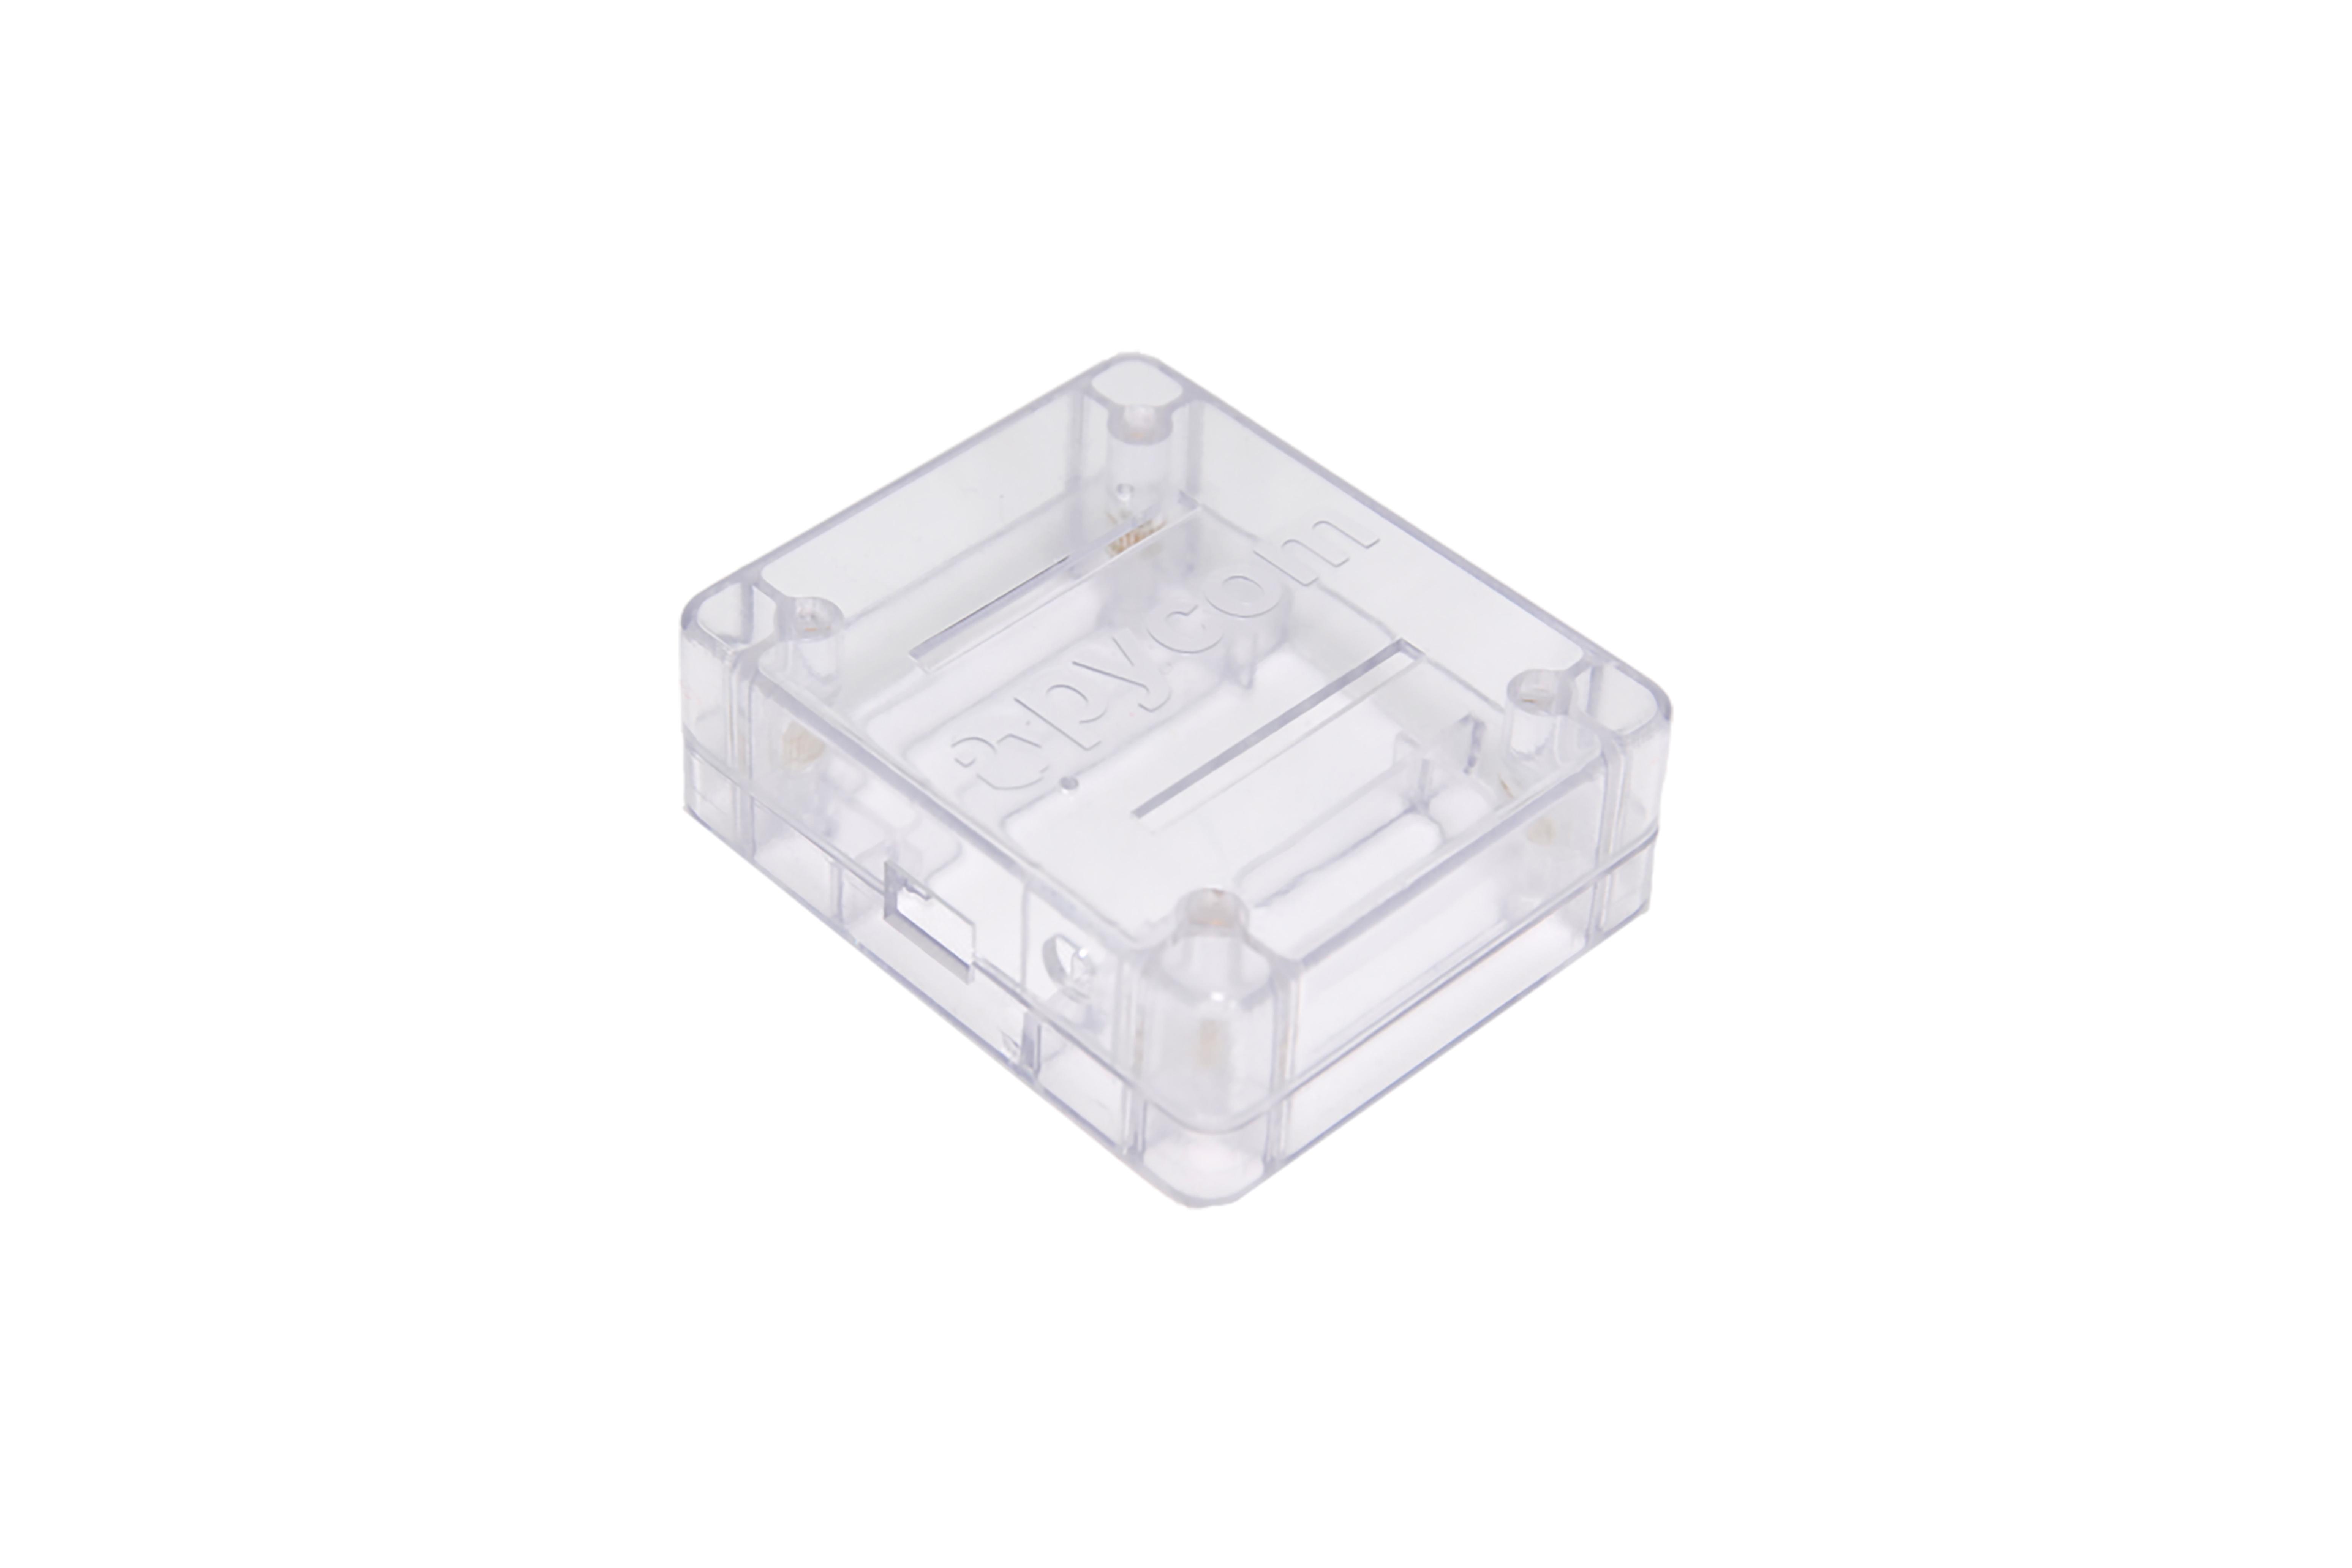 WiPy/LoPy/SiPy ボード用ケース - クリア